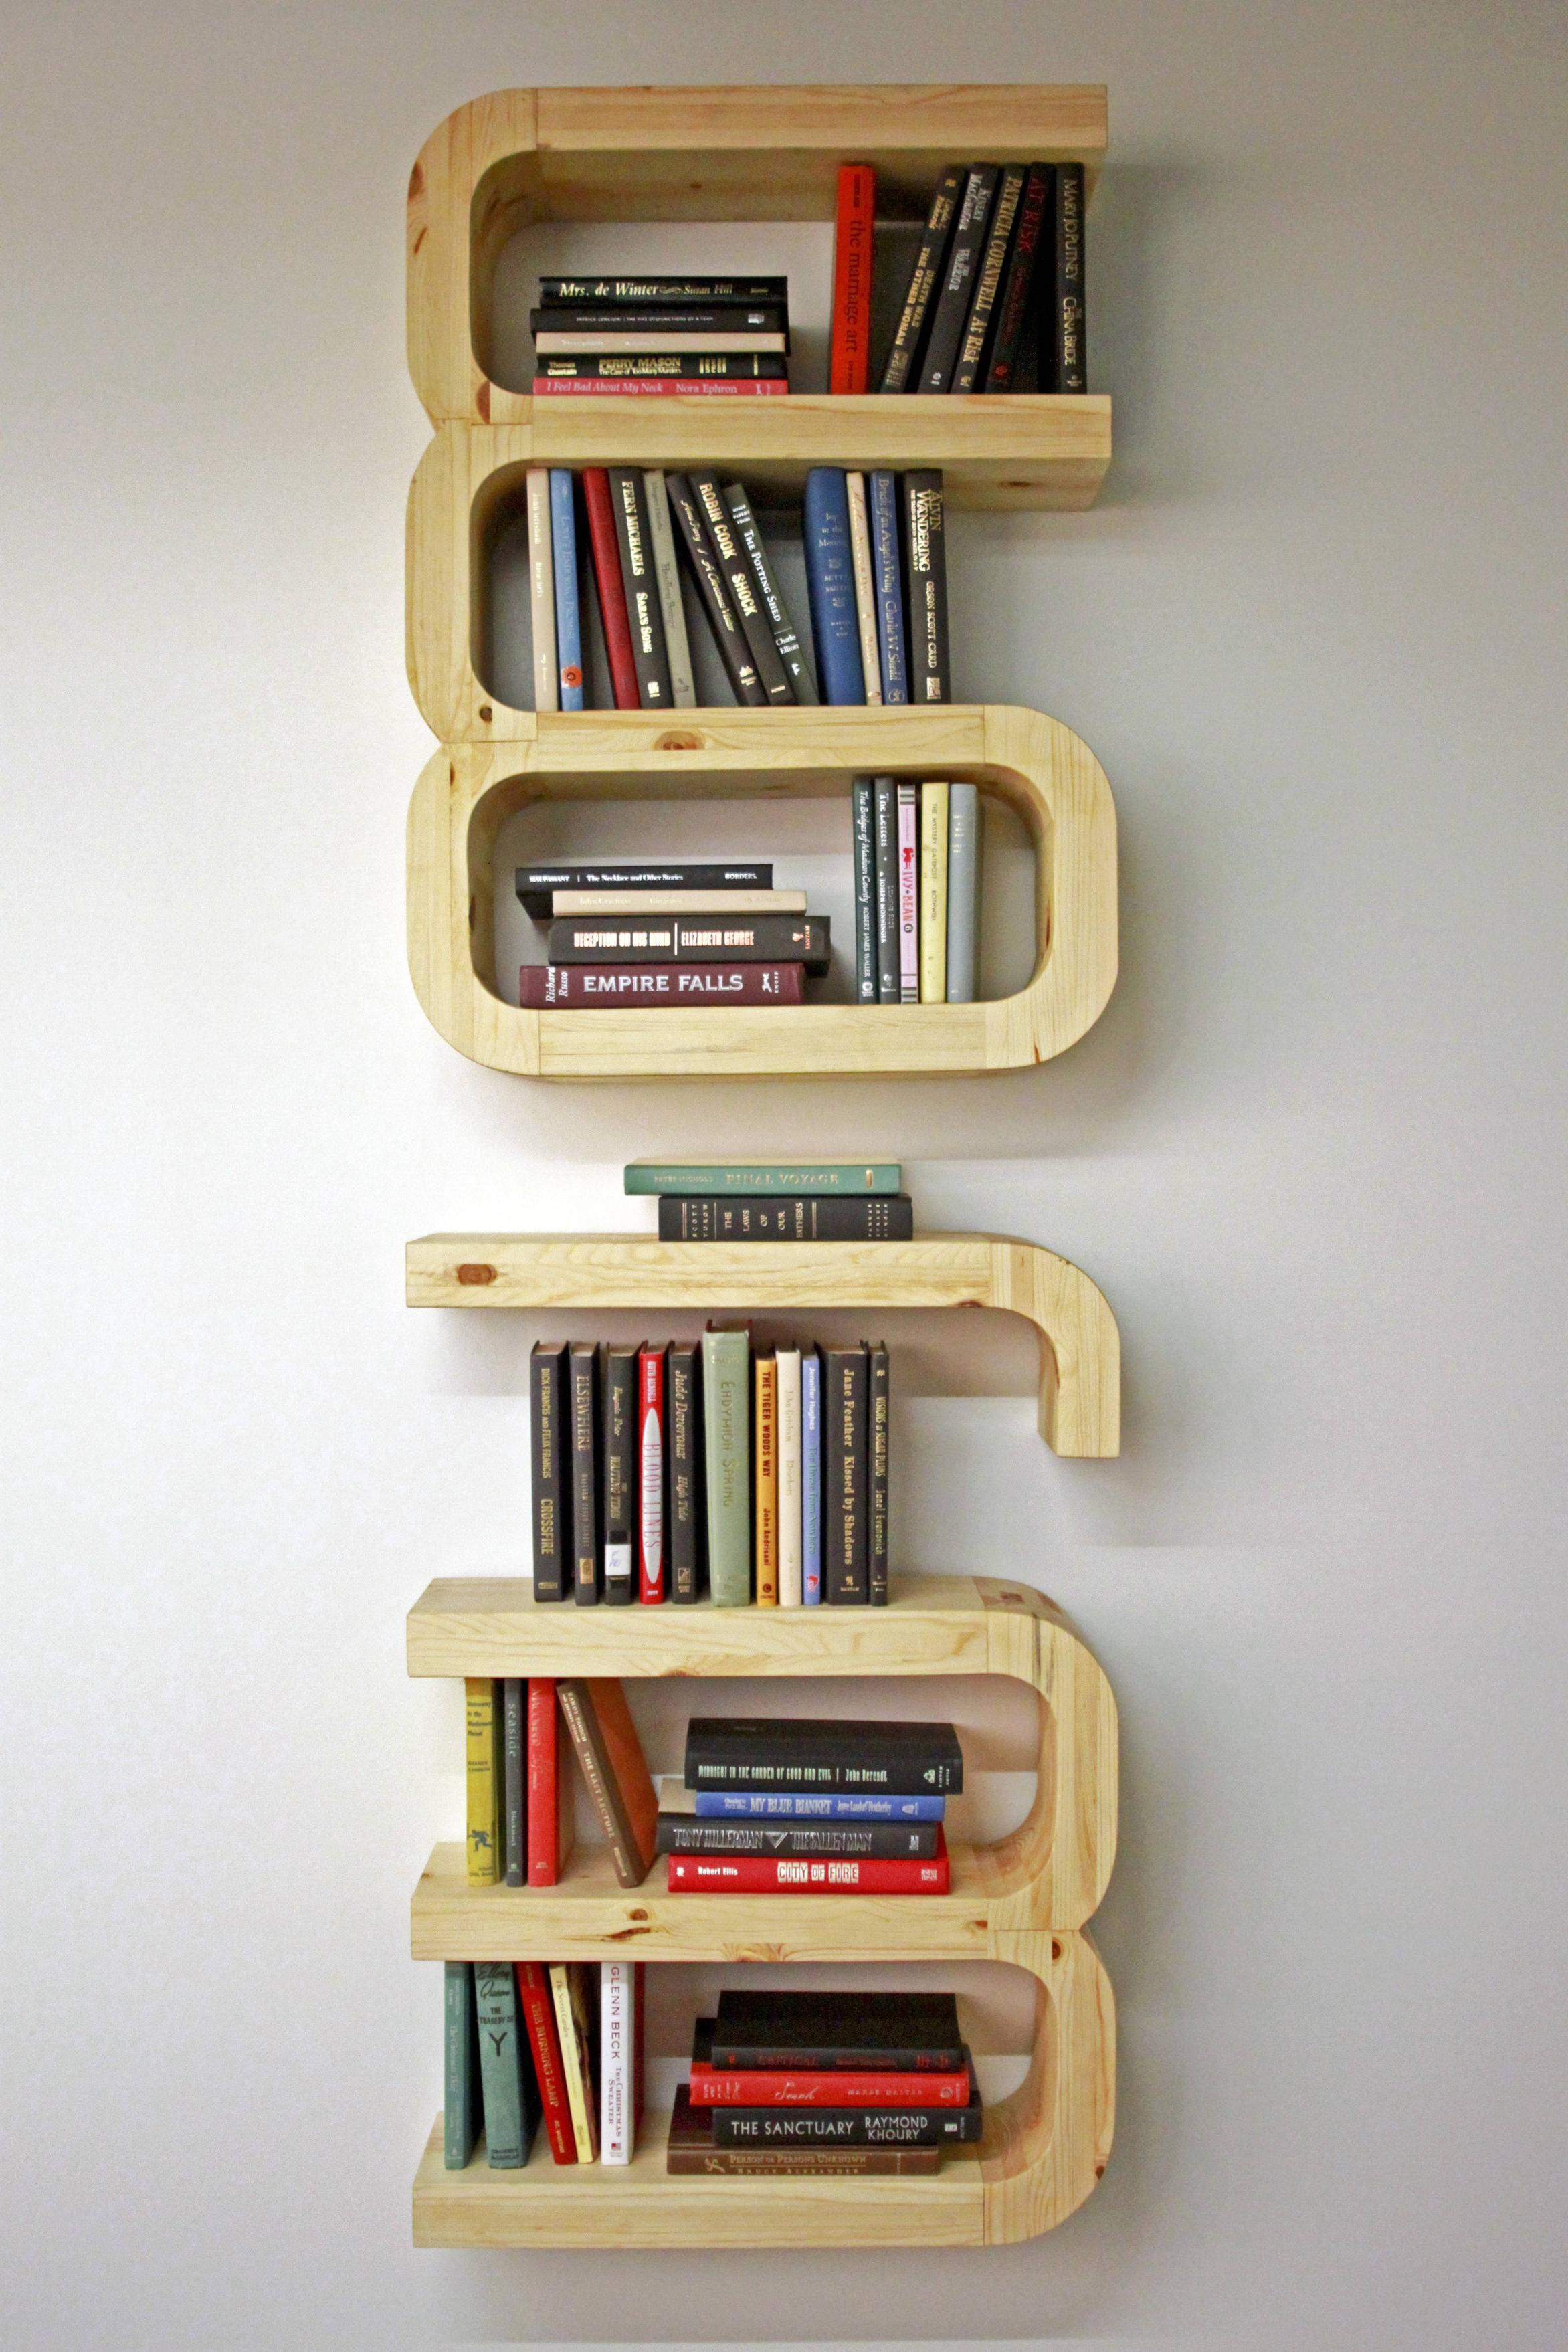 Bookshelf spells the word WORM.